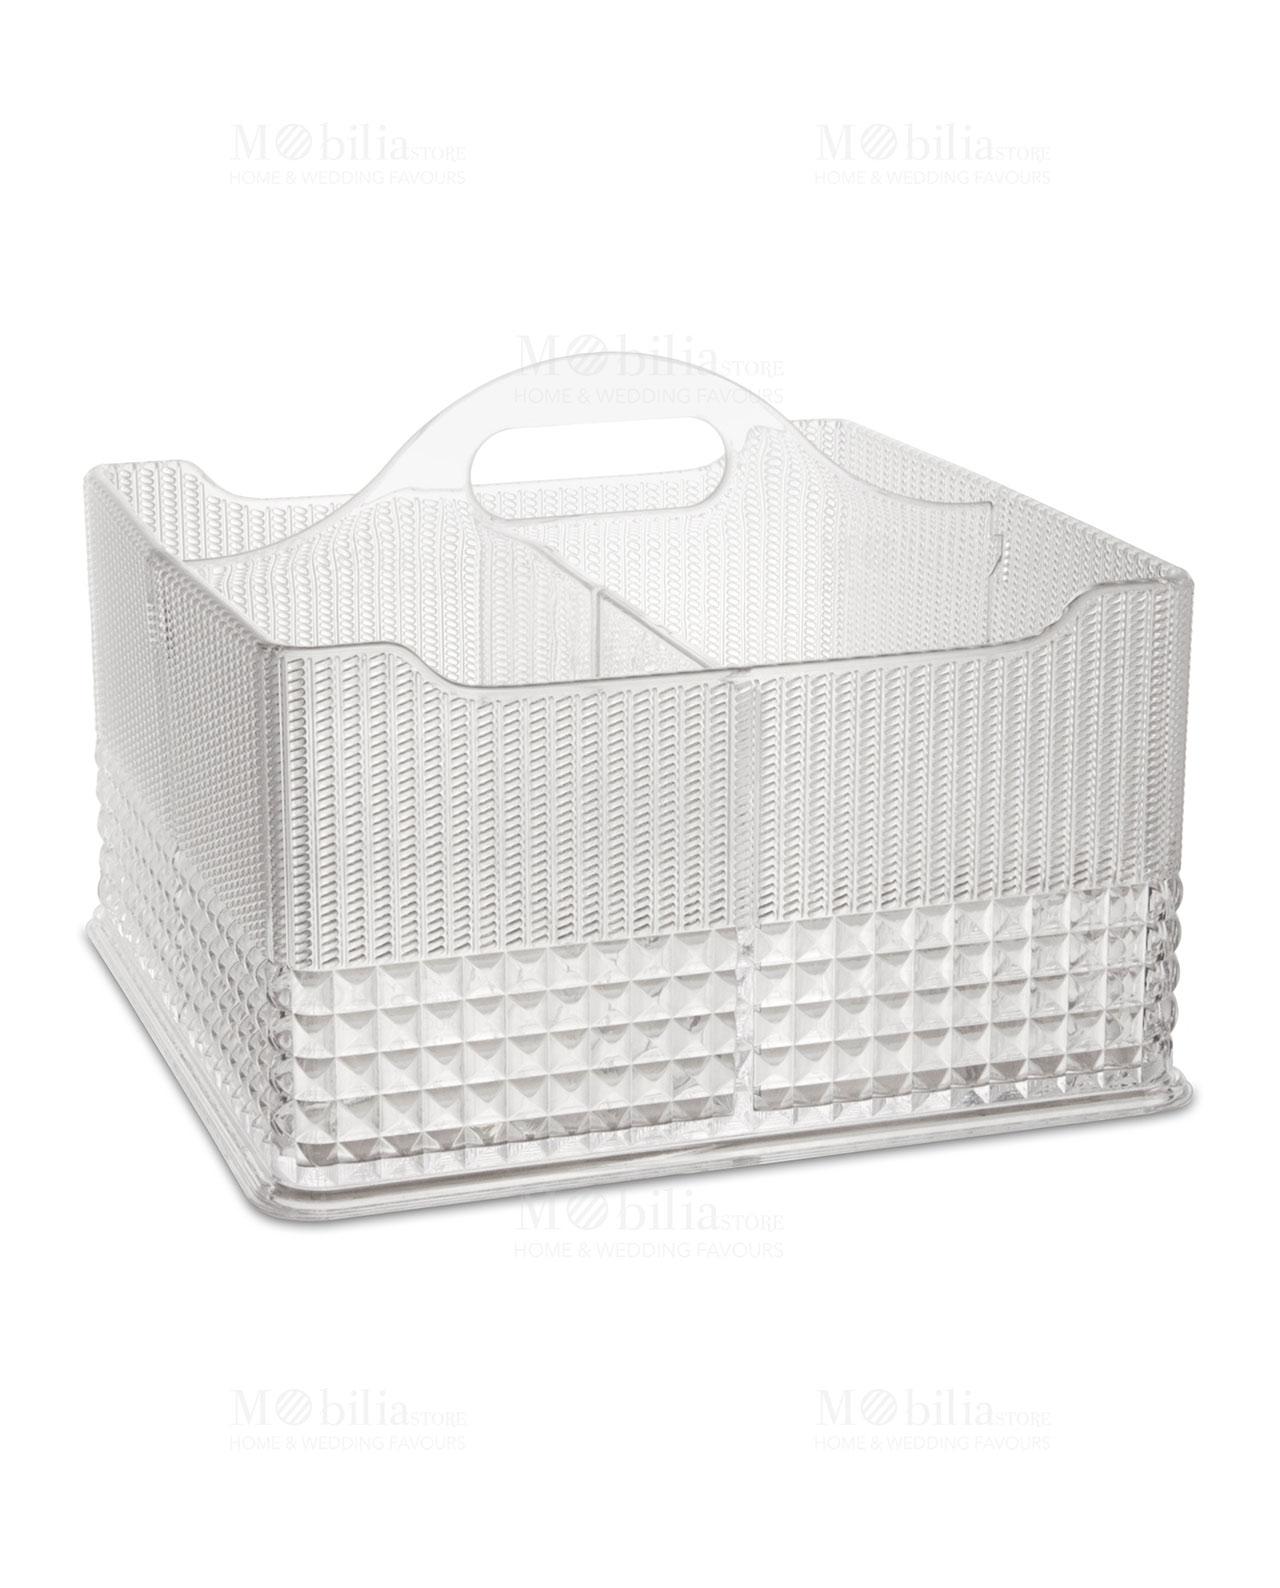 Porta utensili da cucina trasparente chic e zen - kitchen Baci Milano